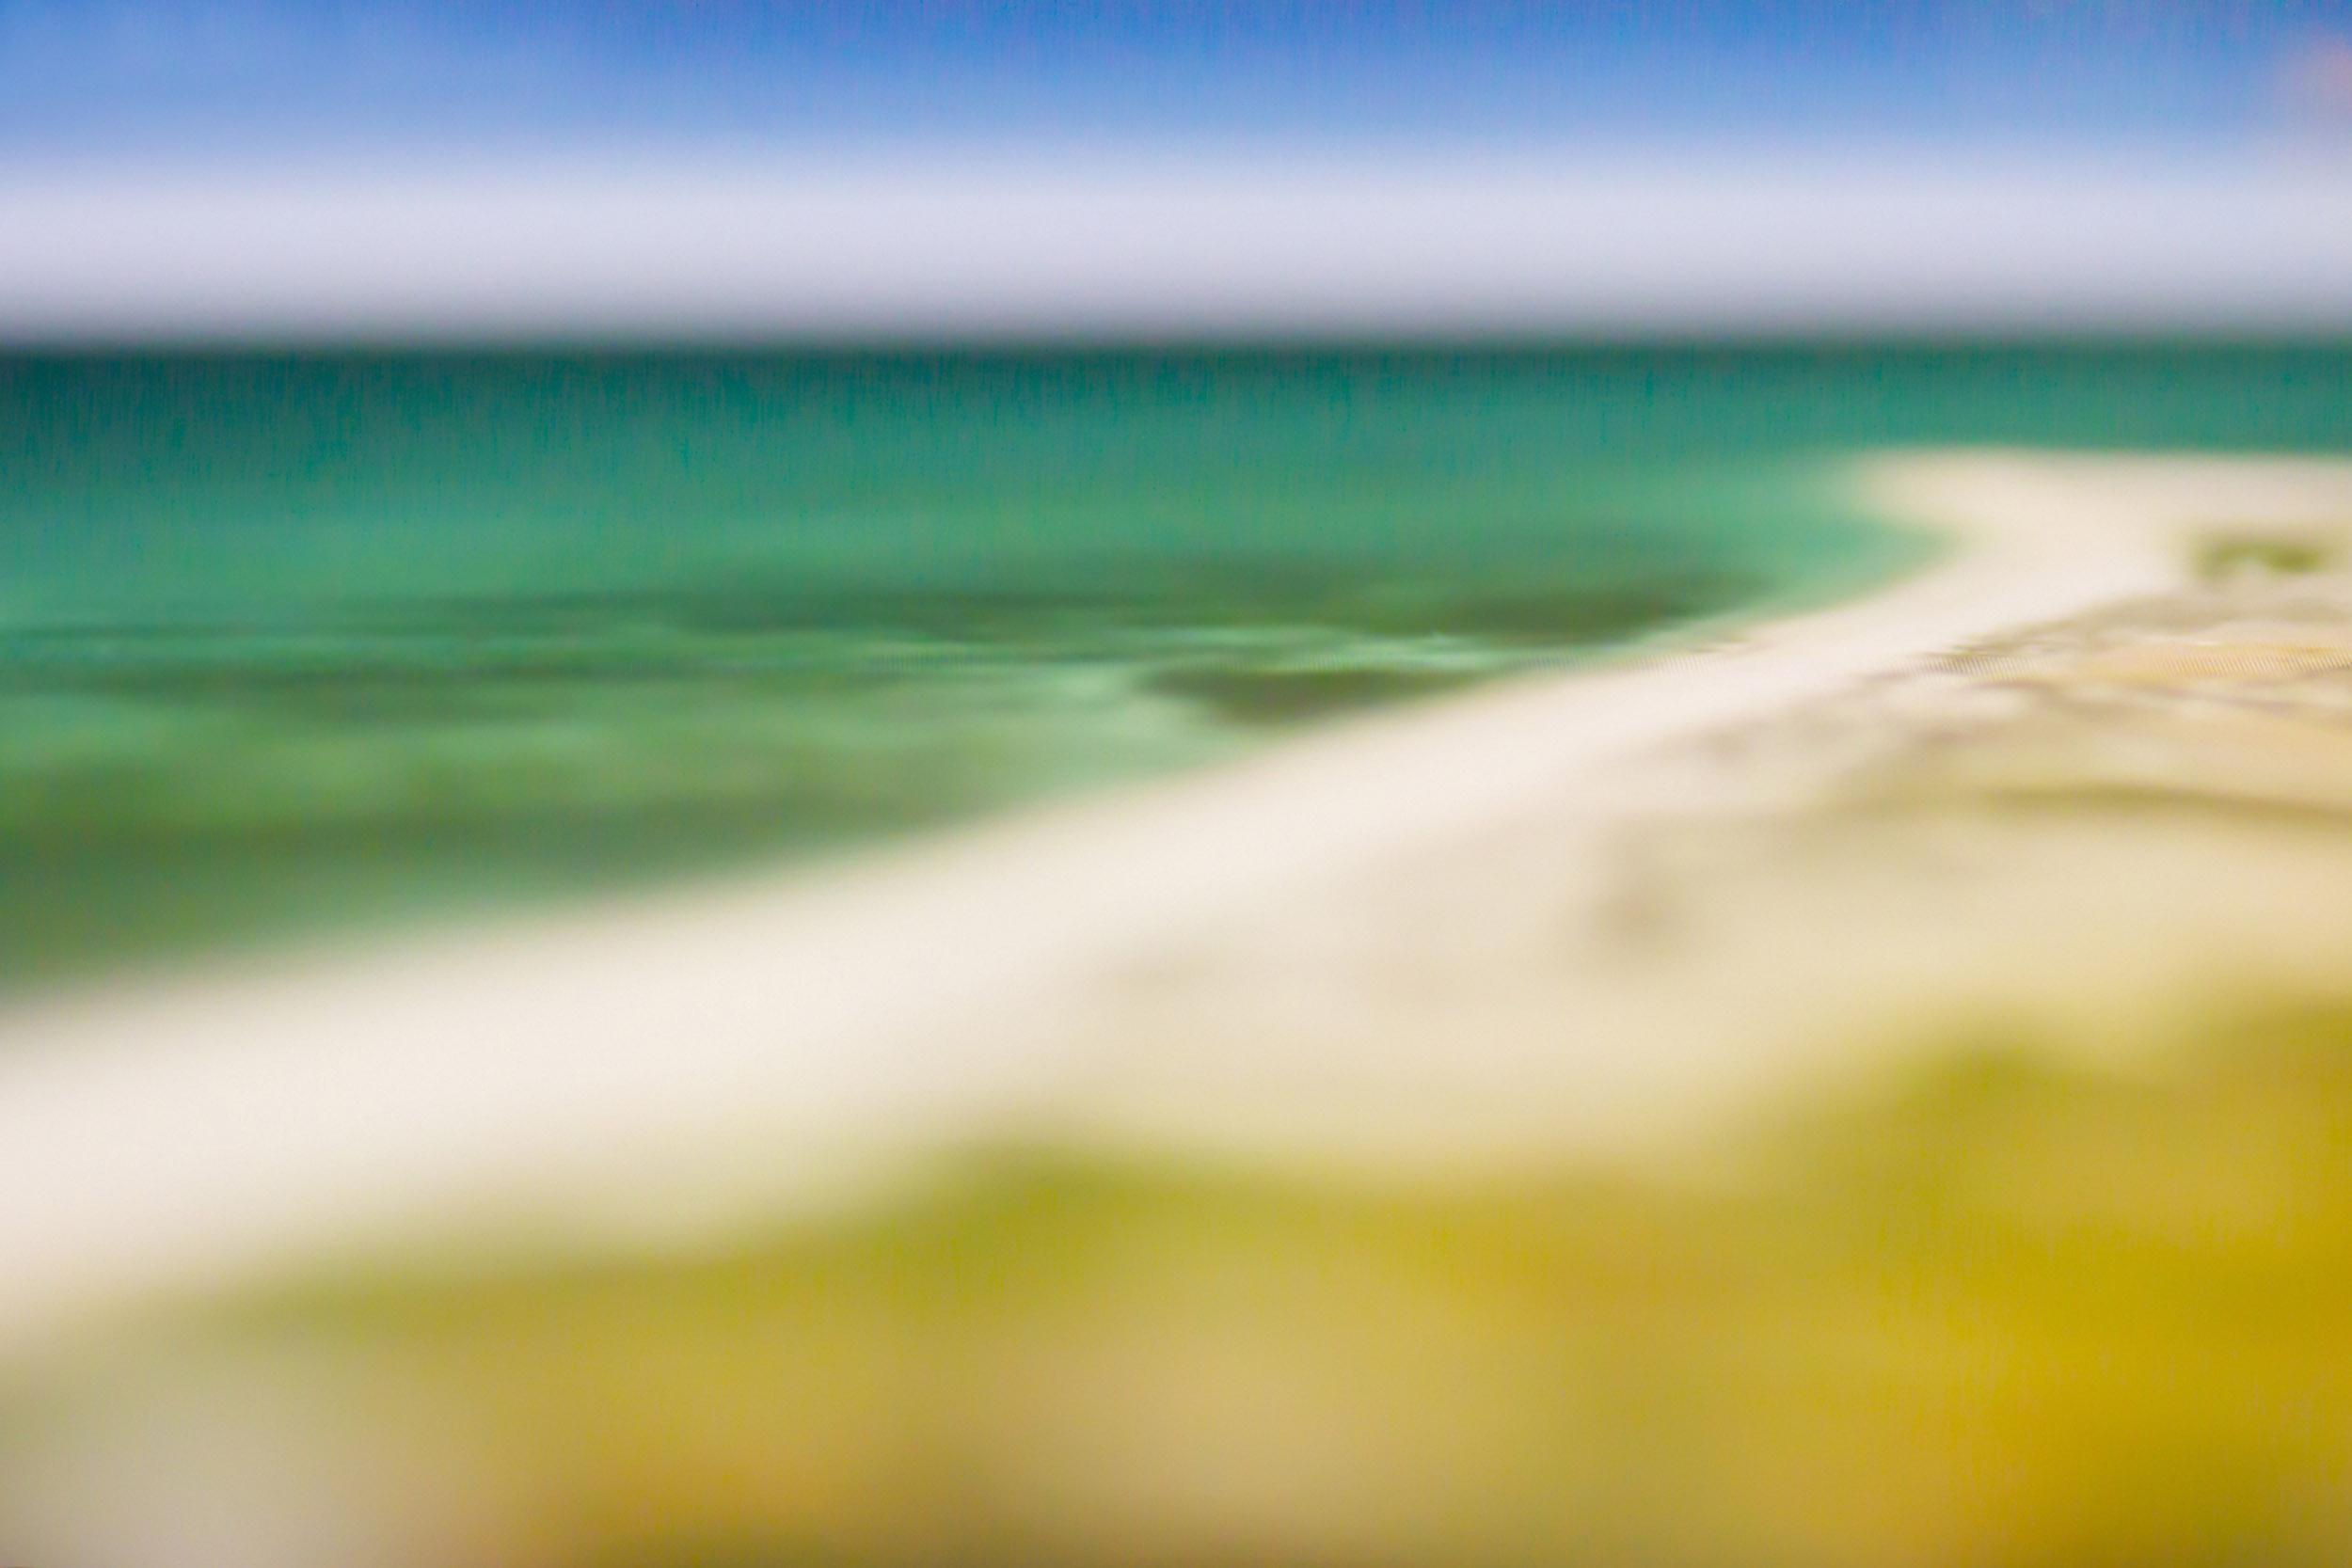 Ras Tanura Beach, Saudi Arabia by Mindy Stricke